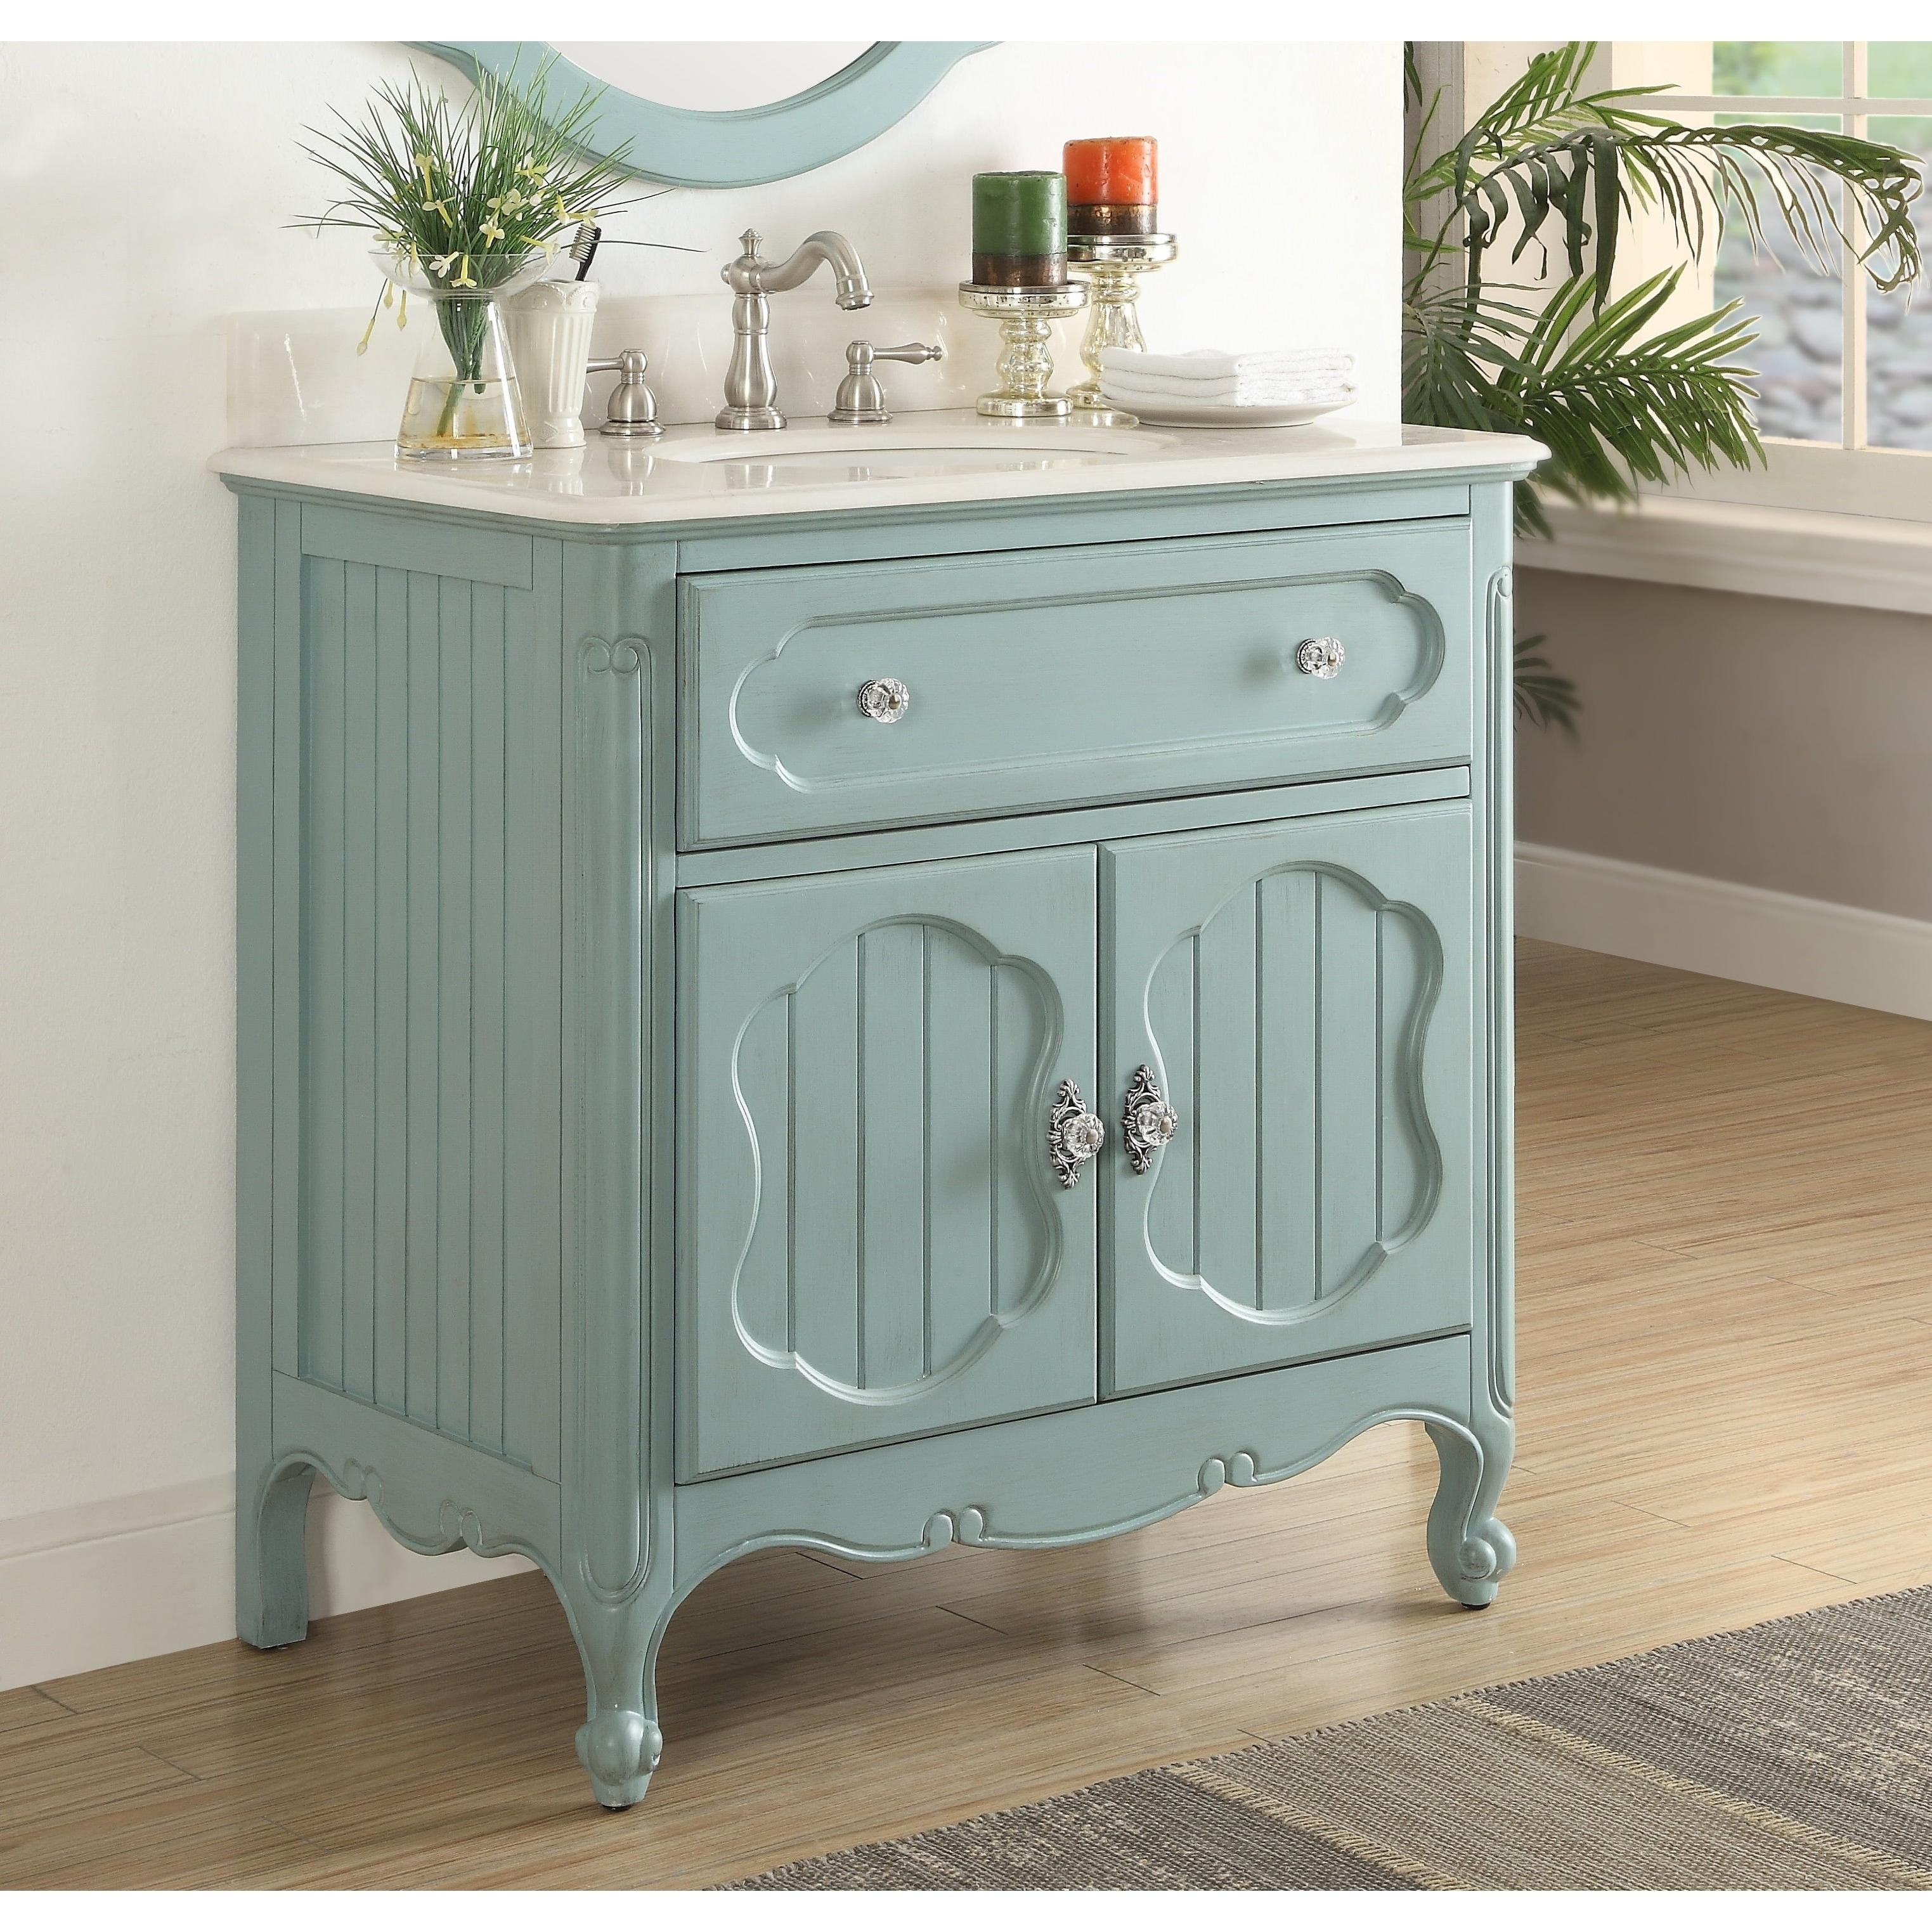 Benton Collection Knoxville Vintage Blue Bathroom Sink Vanity 34 ...